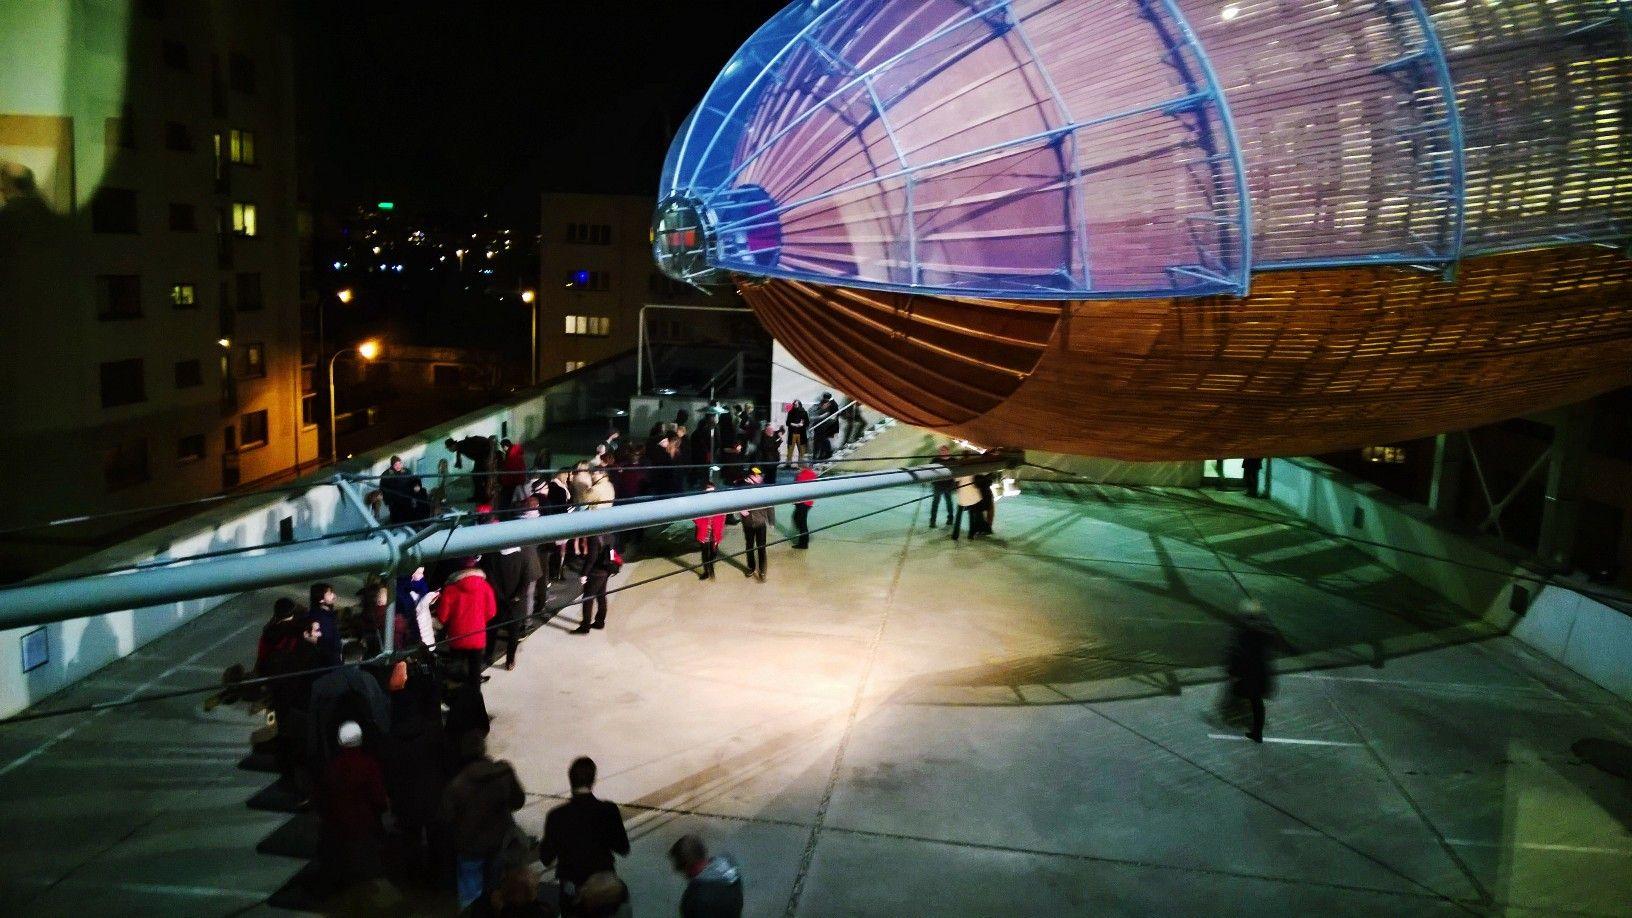 Zeppelin - DOX Center of contemporary art in Prague, Czech - this is the zeppelin called Gulliver by architects HAMR - Hut architektury Martin Rajnis ( Martin Rajnis, David Kubik, Leos Valka, Zbynek Srutek)